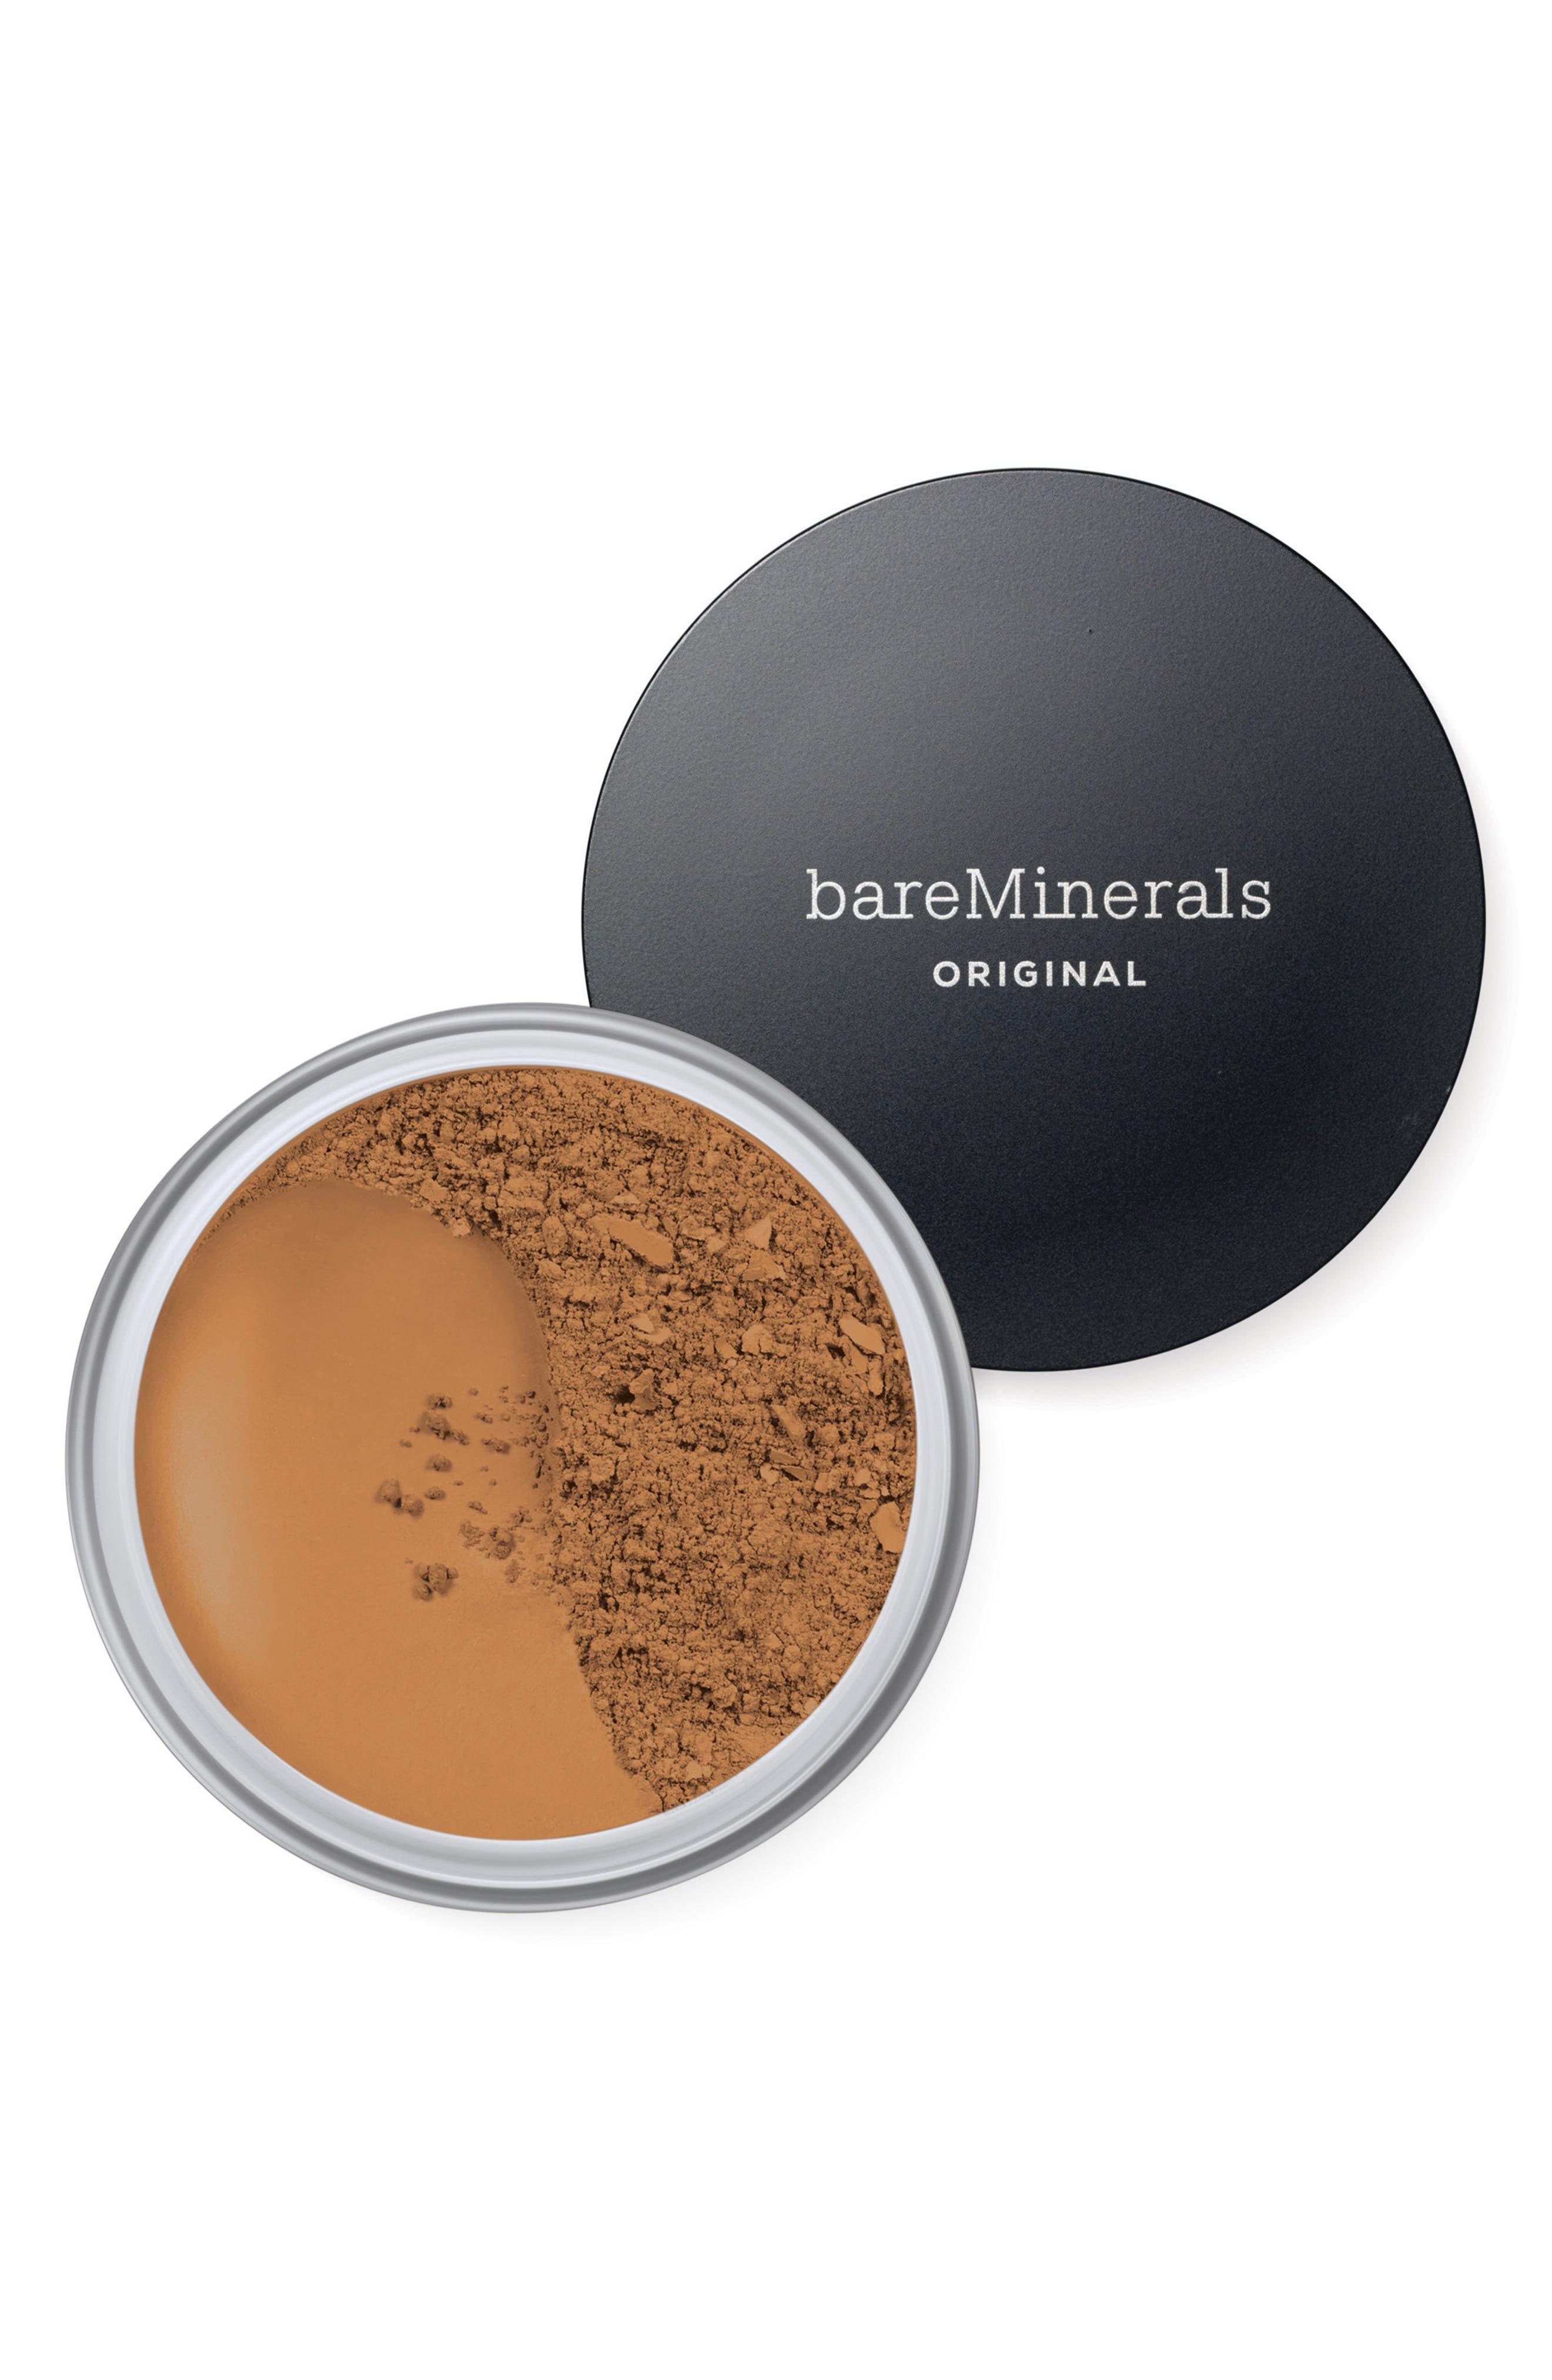 Bareminerals Original Foundation Spf 15 Powder Foundation